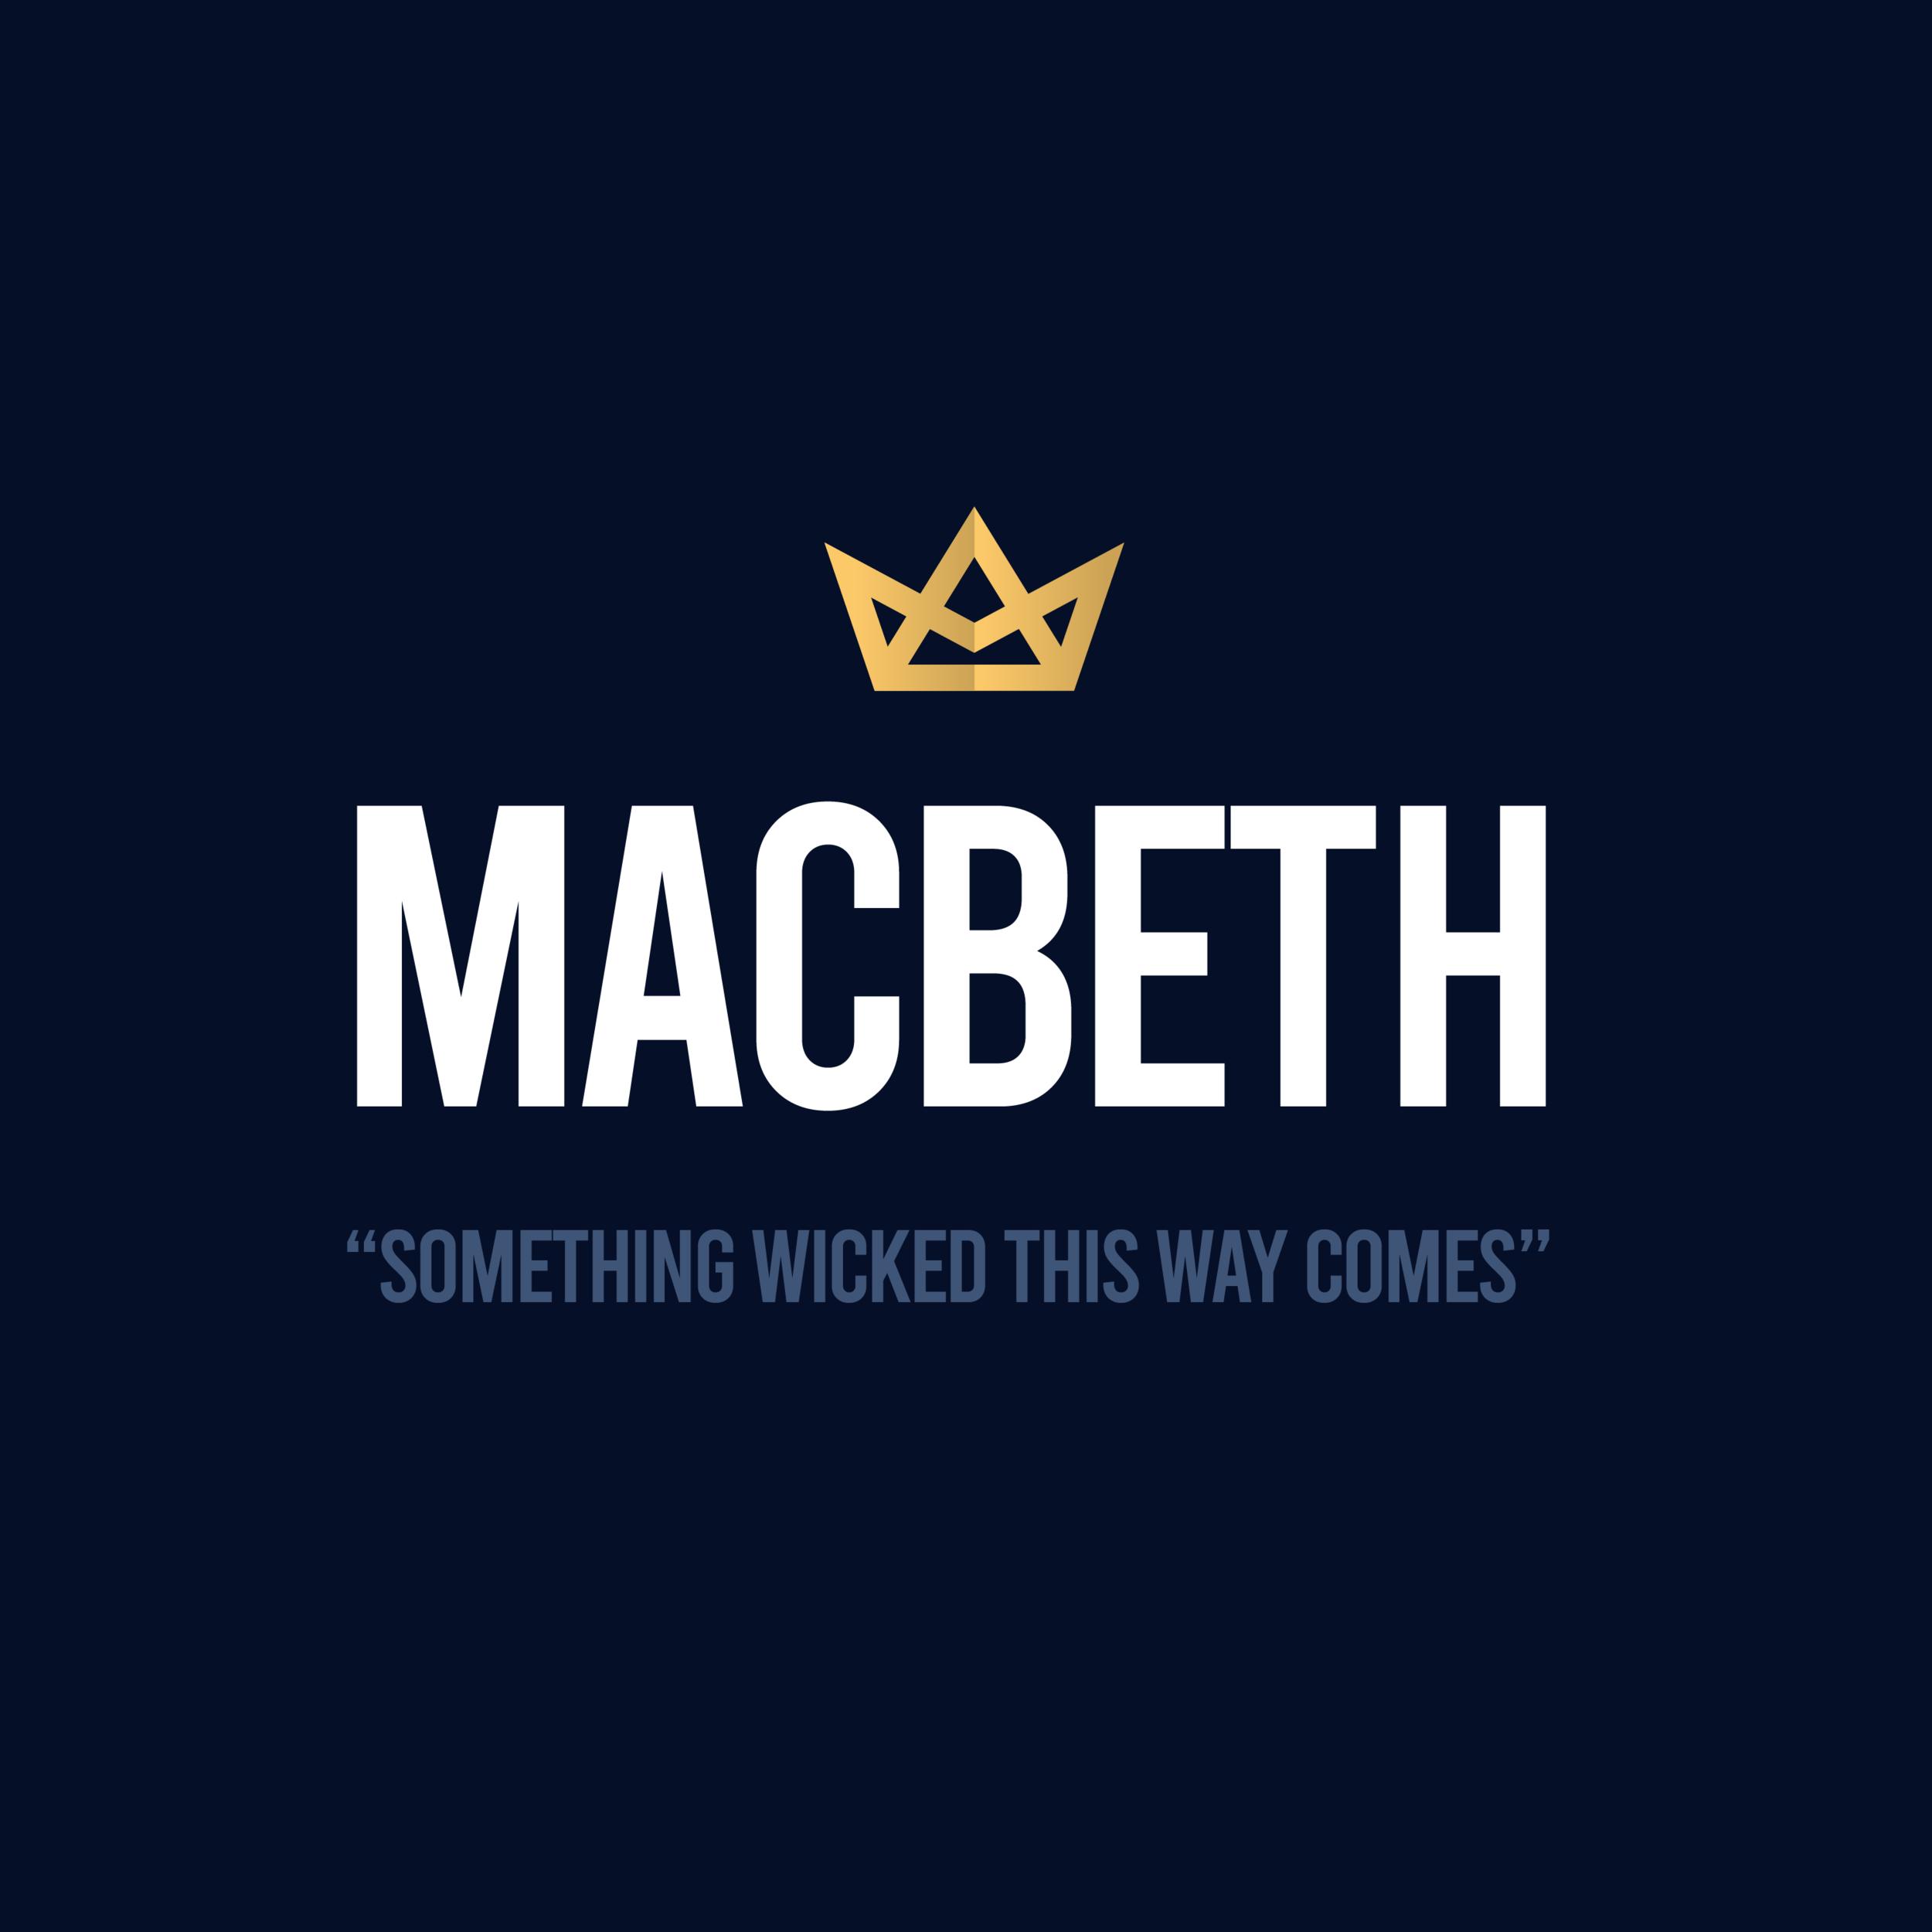 Macbeth_LOGO.png